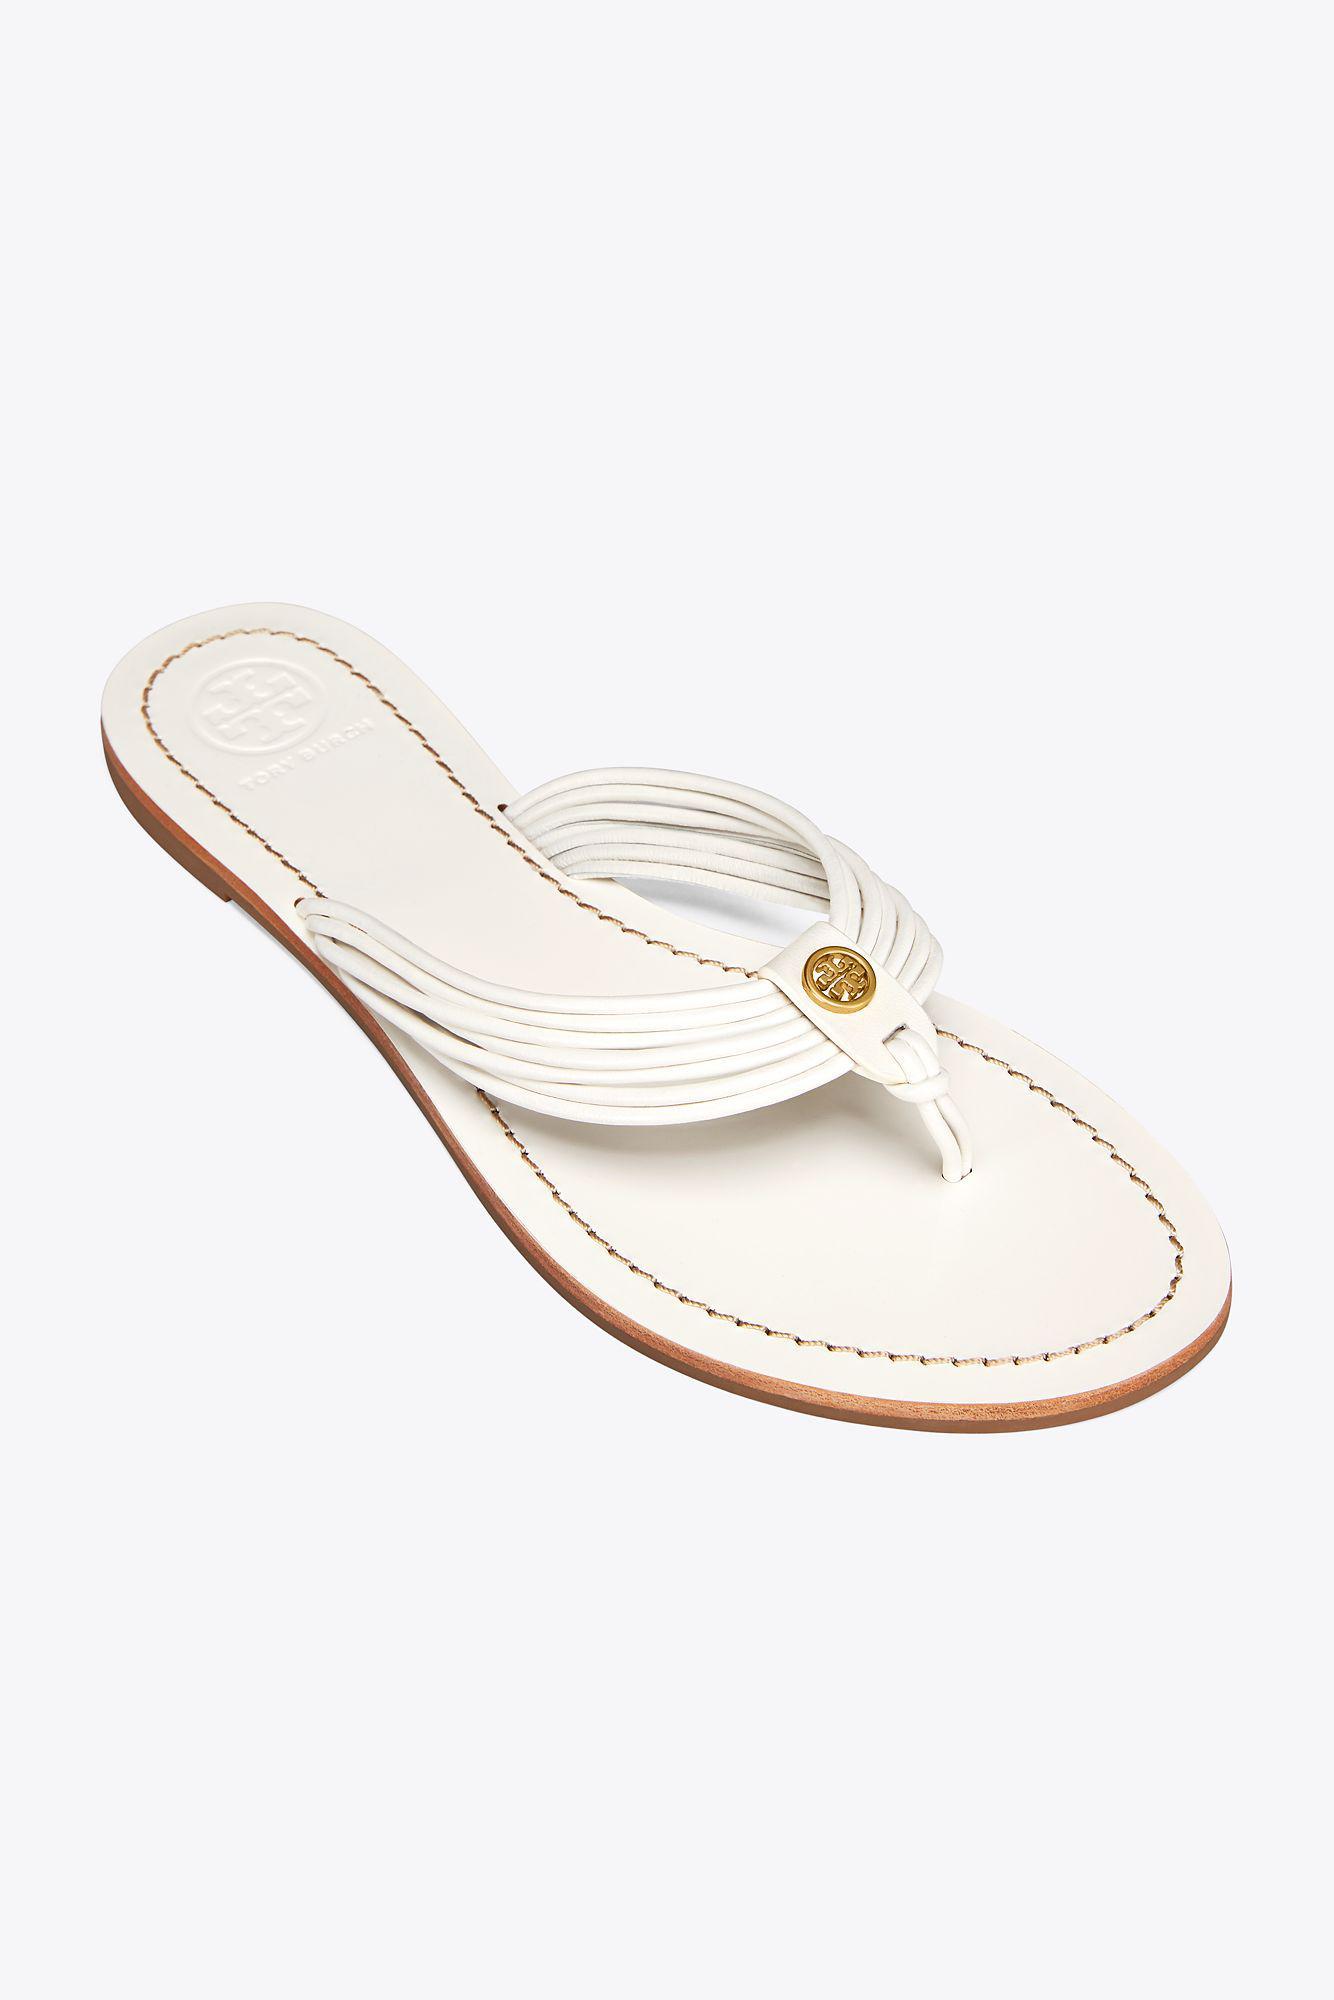 7b74540ebdc Lyst - Tory Burch Sienna Flat Thong Sandal in White